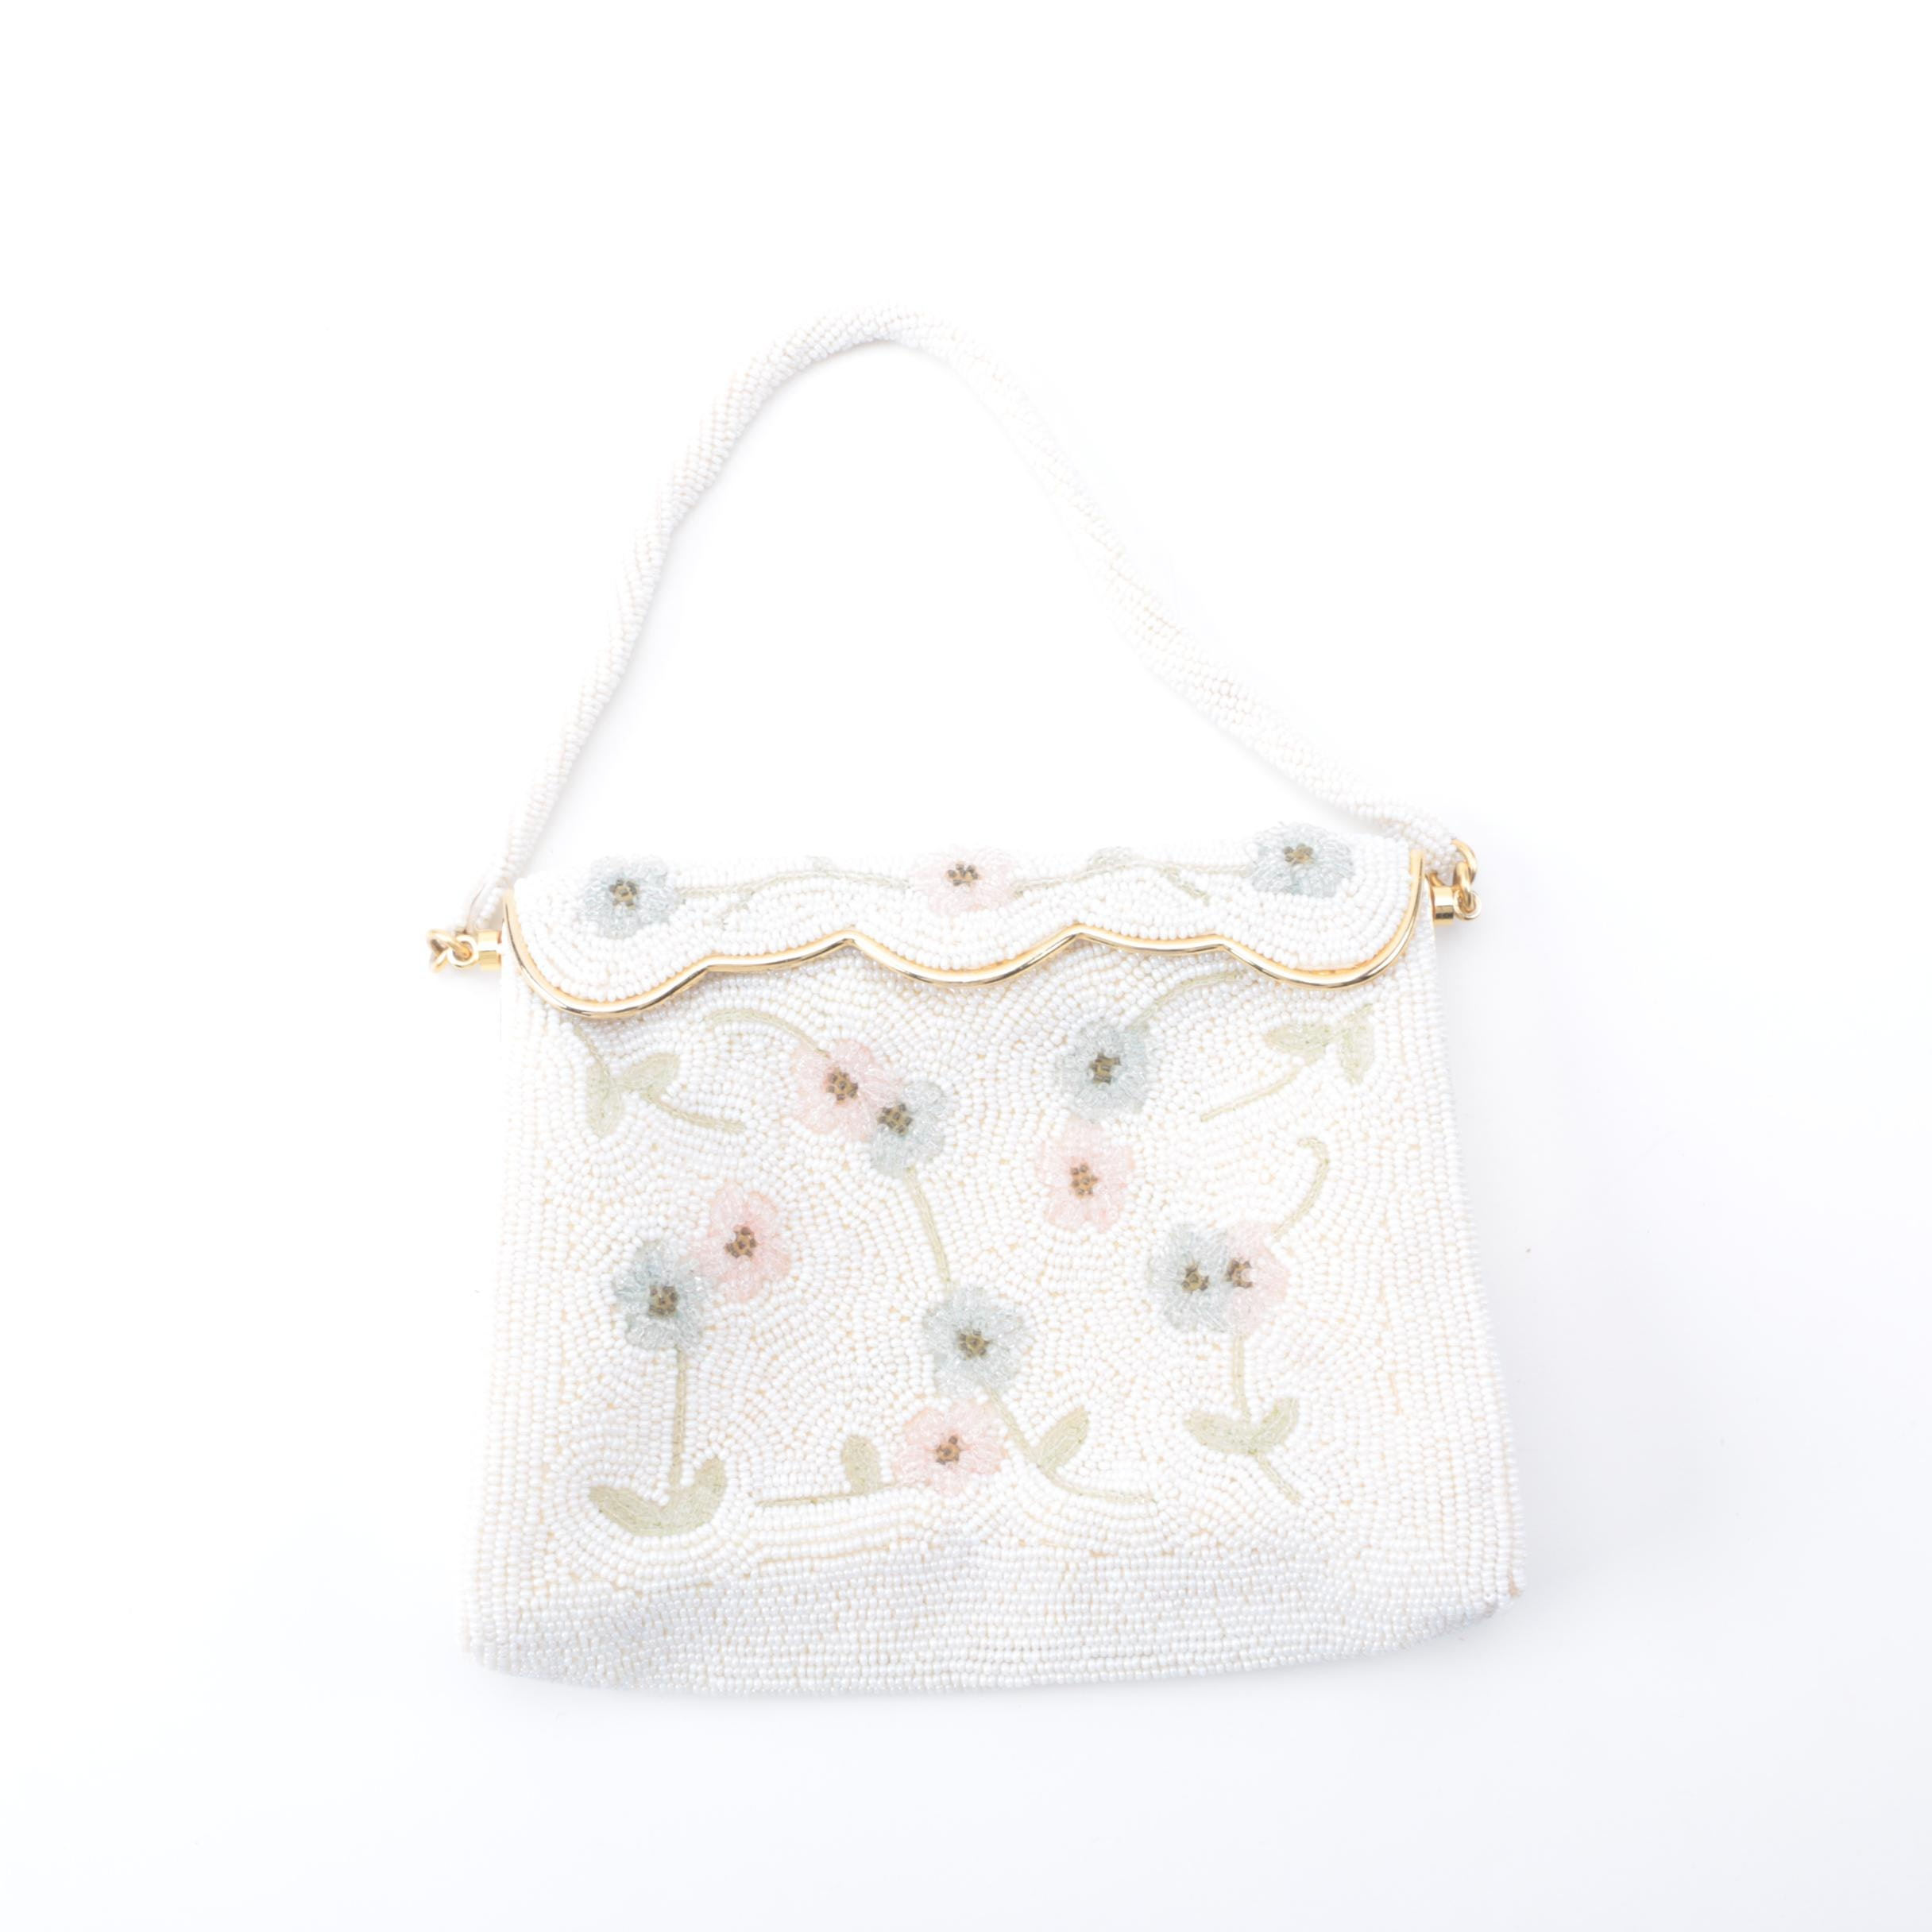 Vintage Beaded Floral Handbag